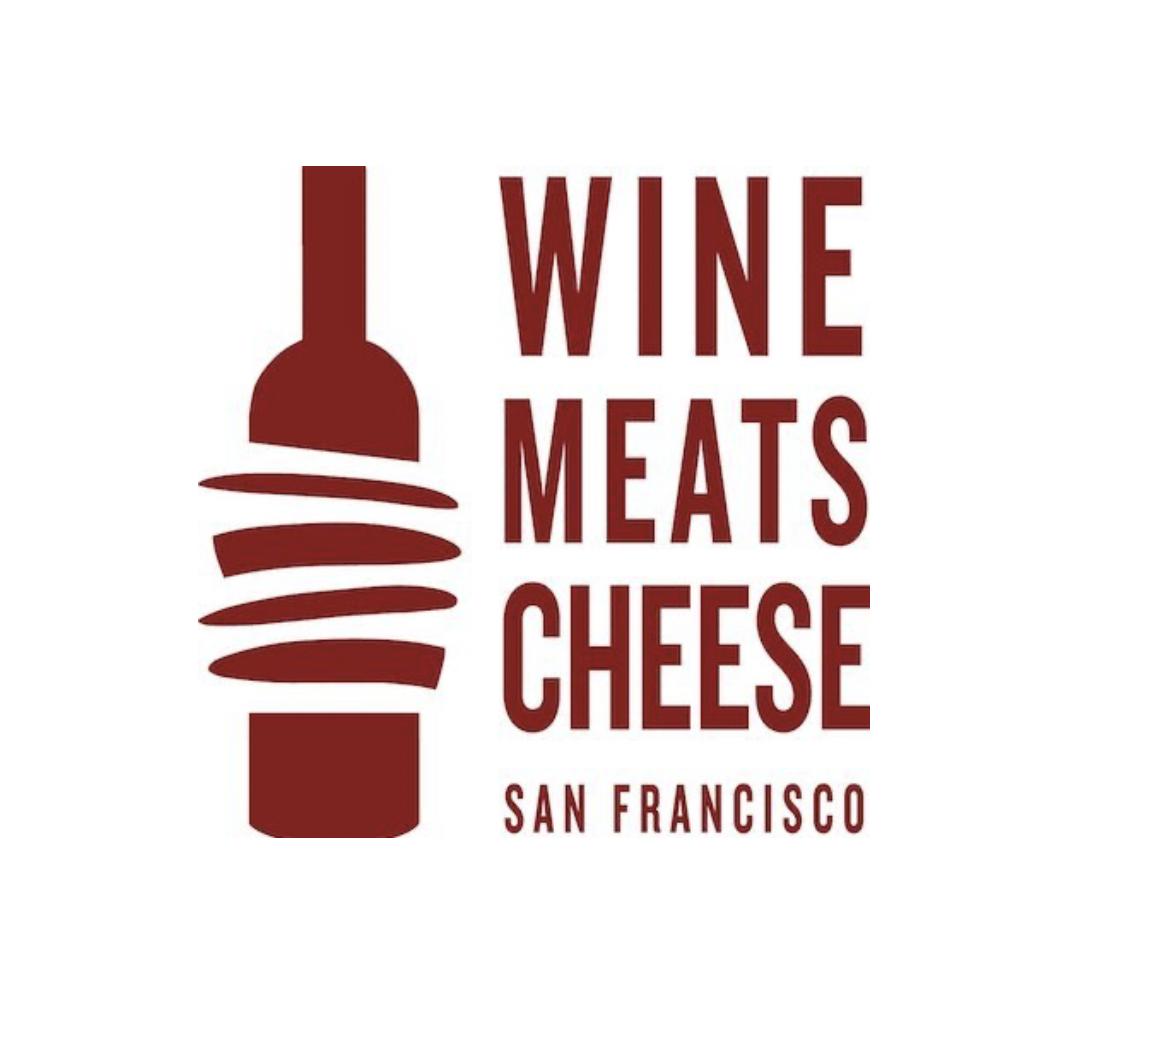 Wine Meats Cheese logo